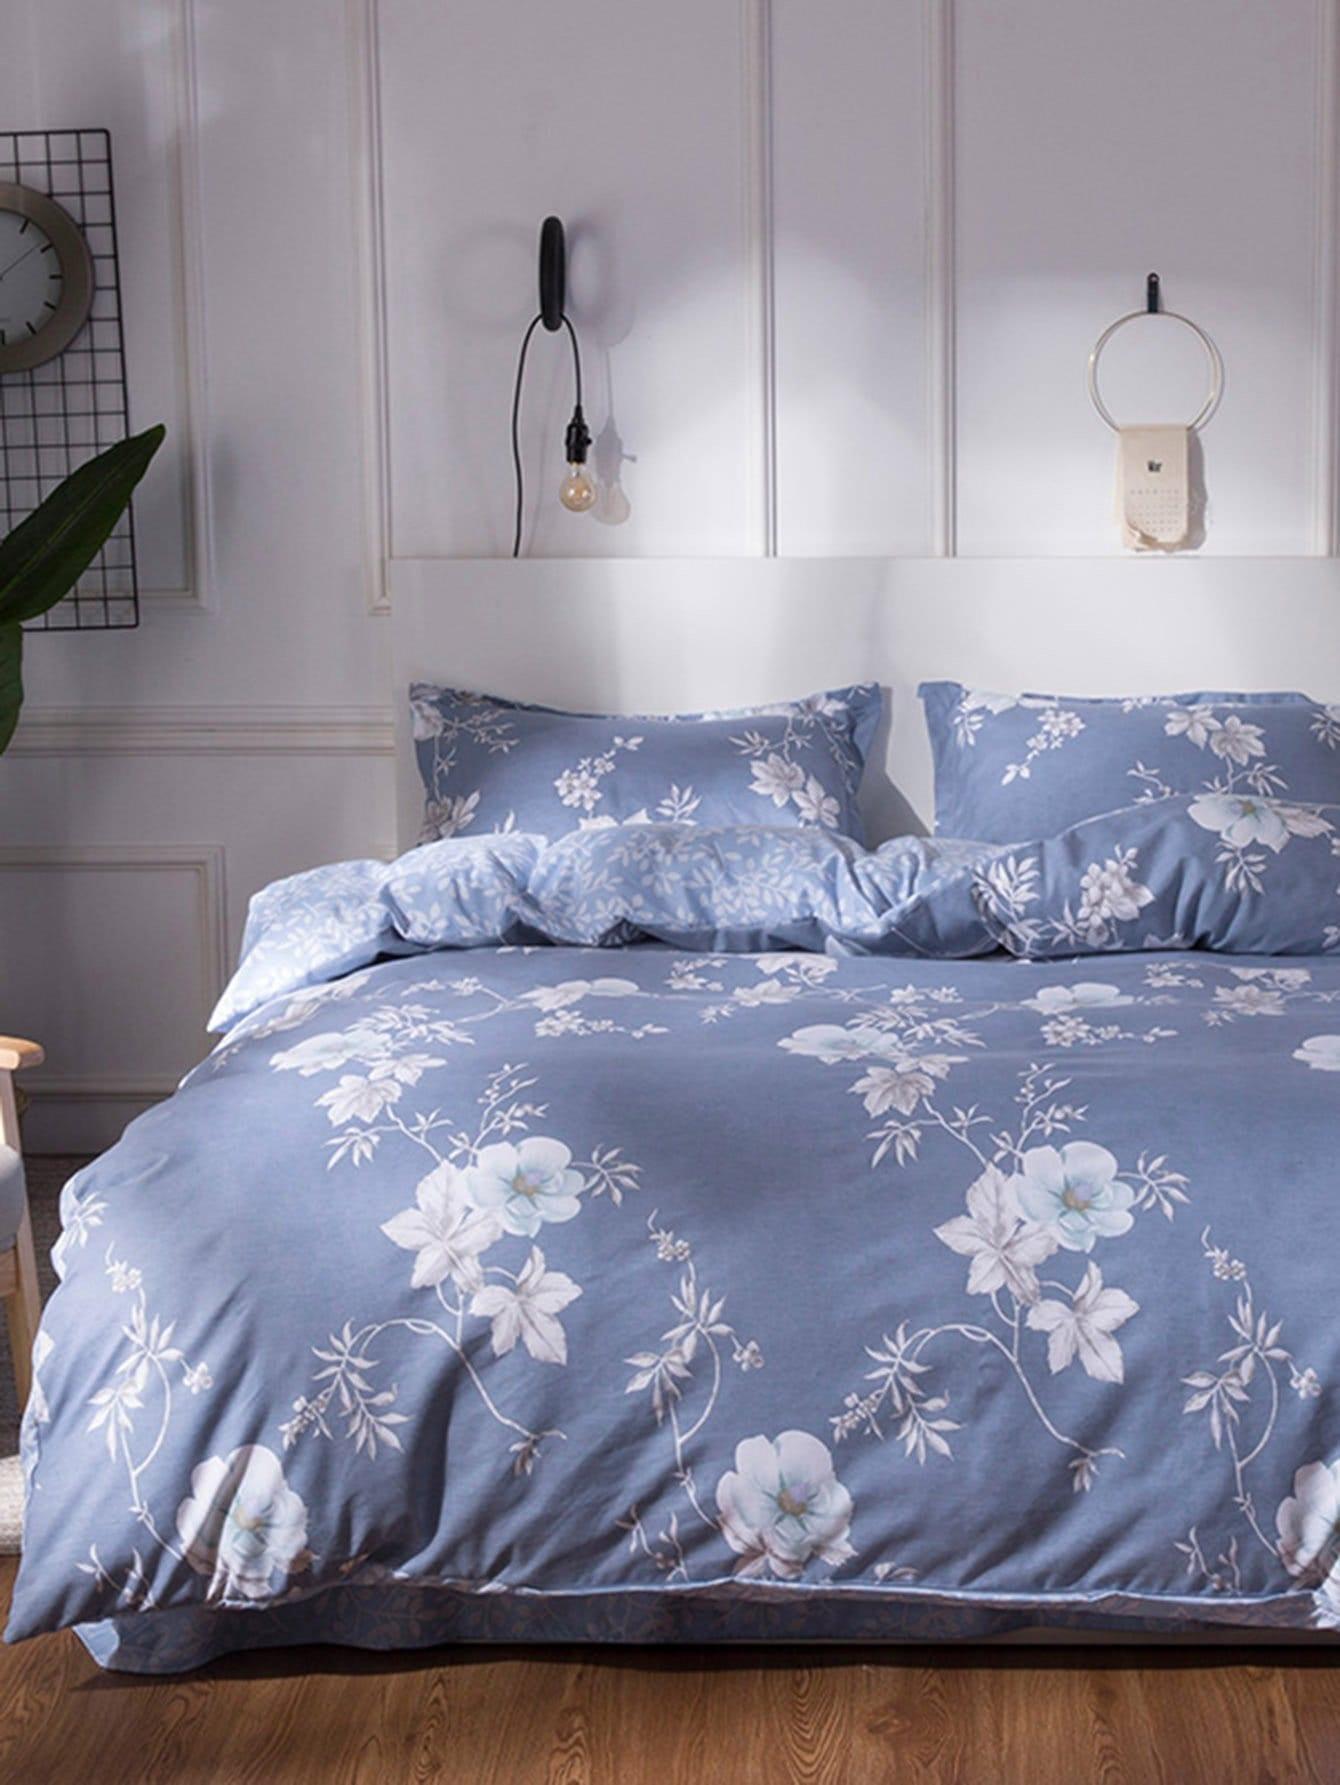 Floral Overlay Print Bedding Set 1 5m 4pcs floral print bedding set